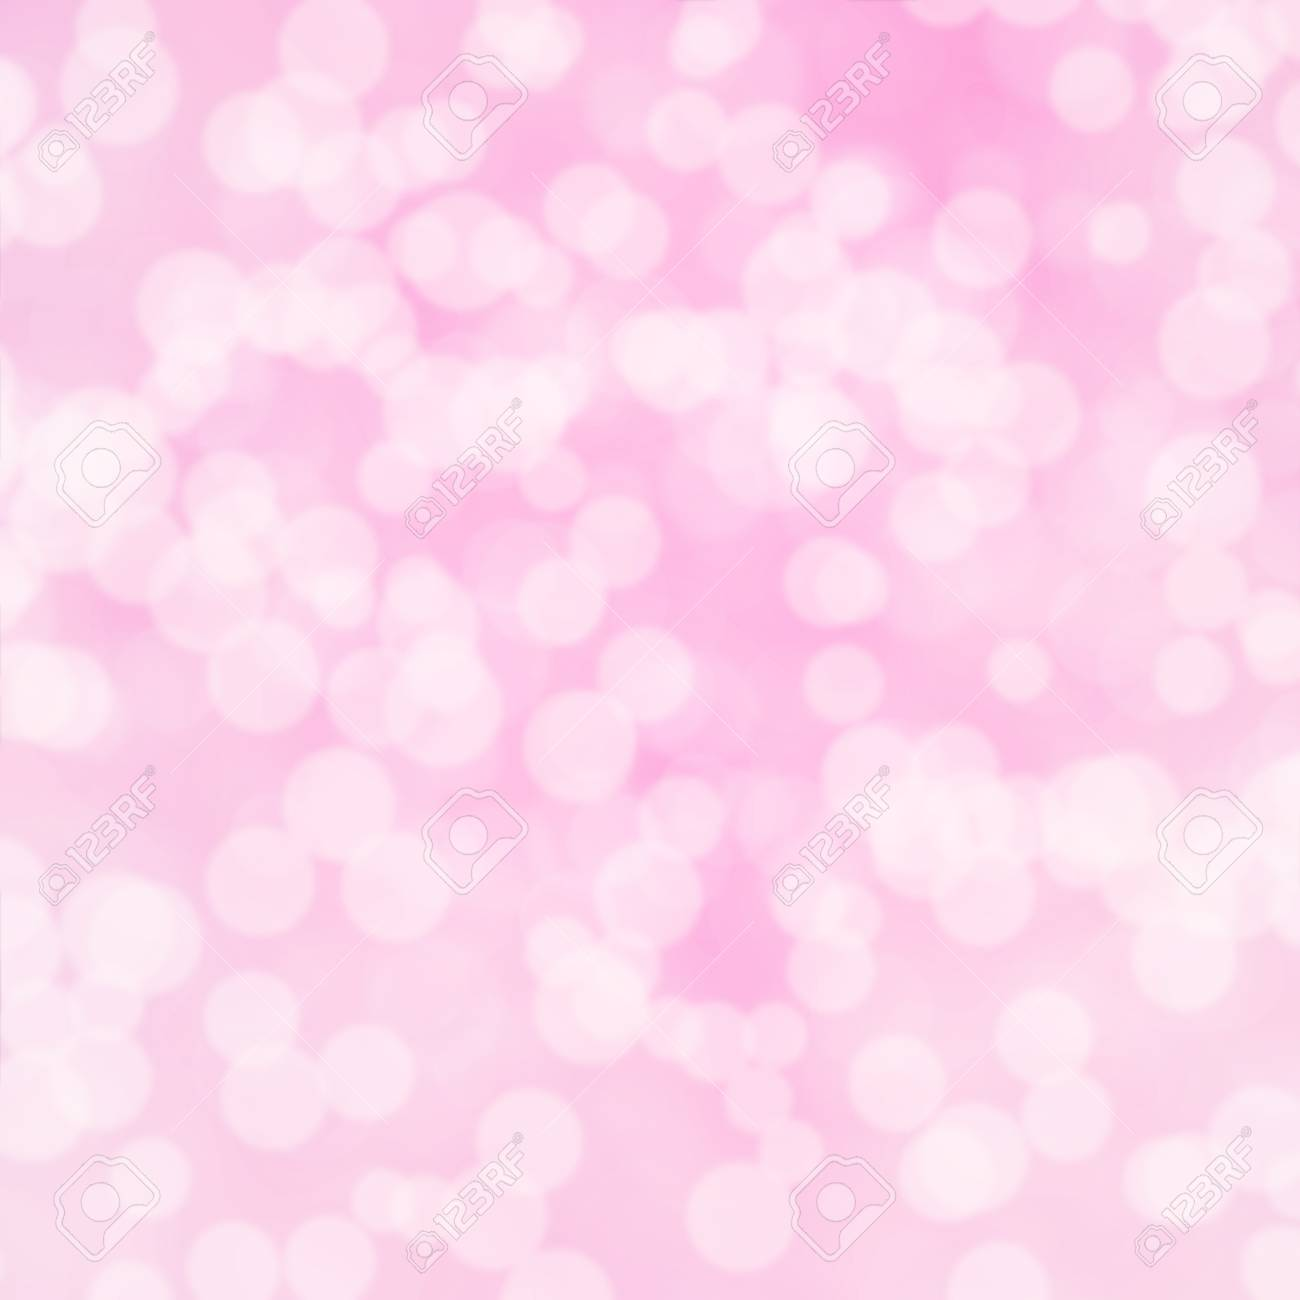 Light Pink Backgrounds Remar